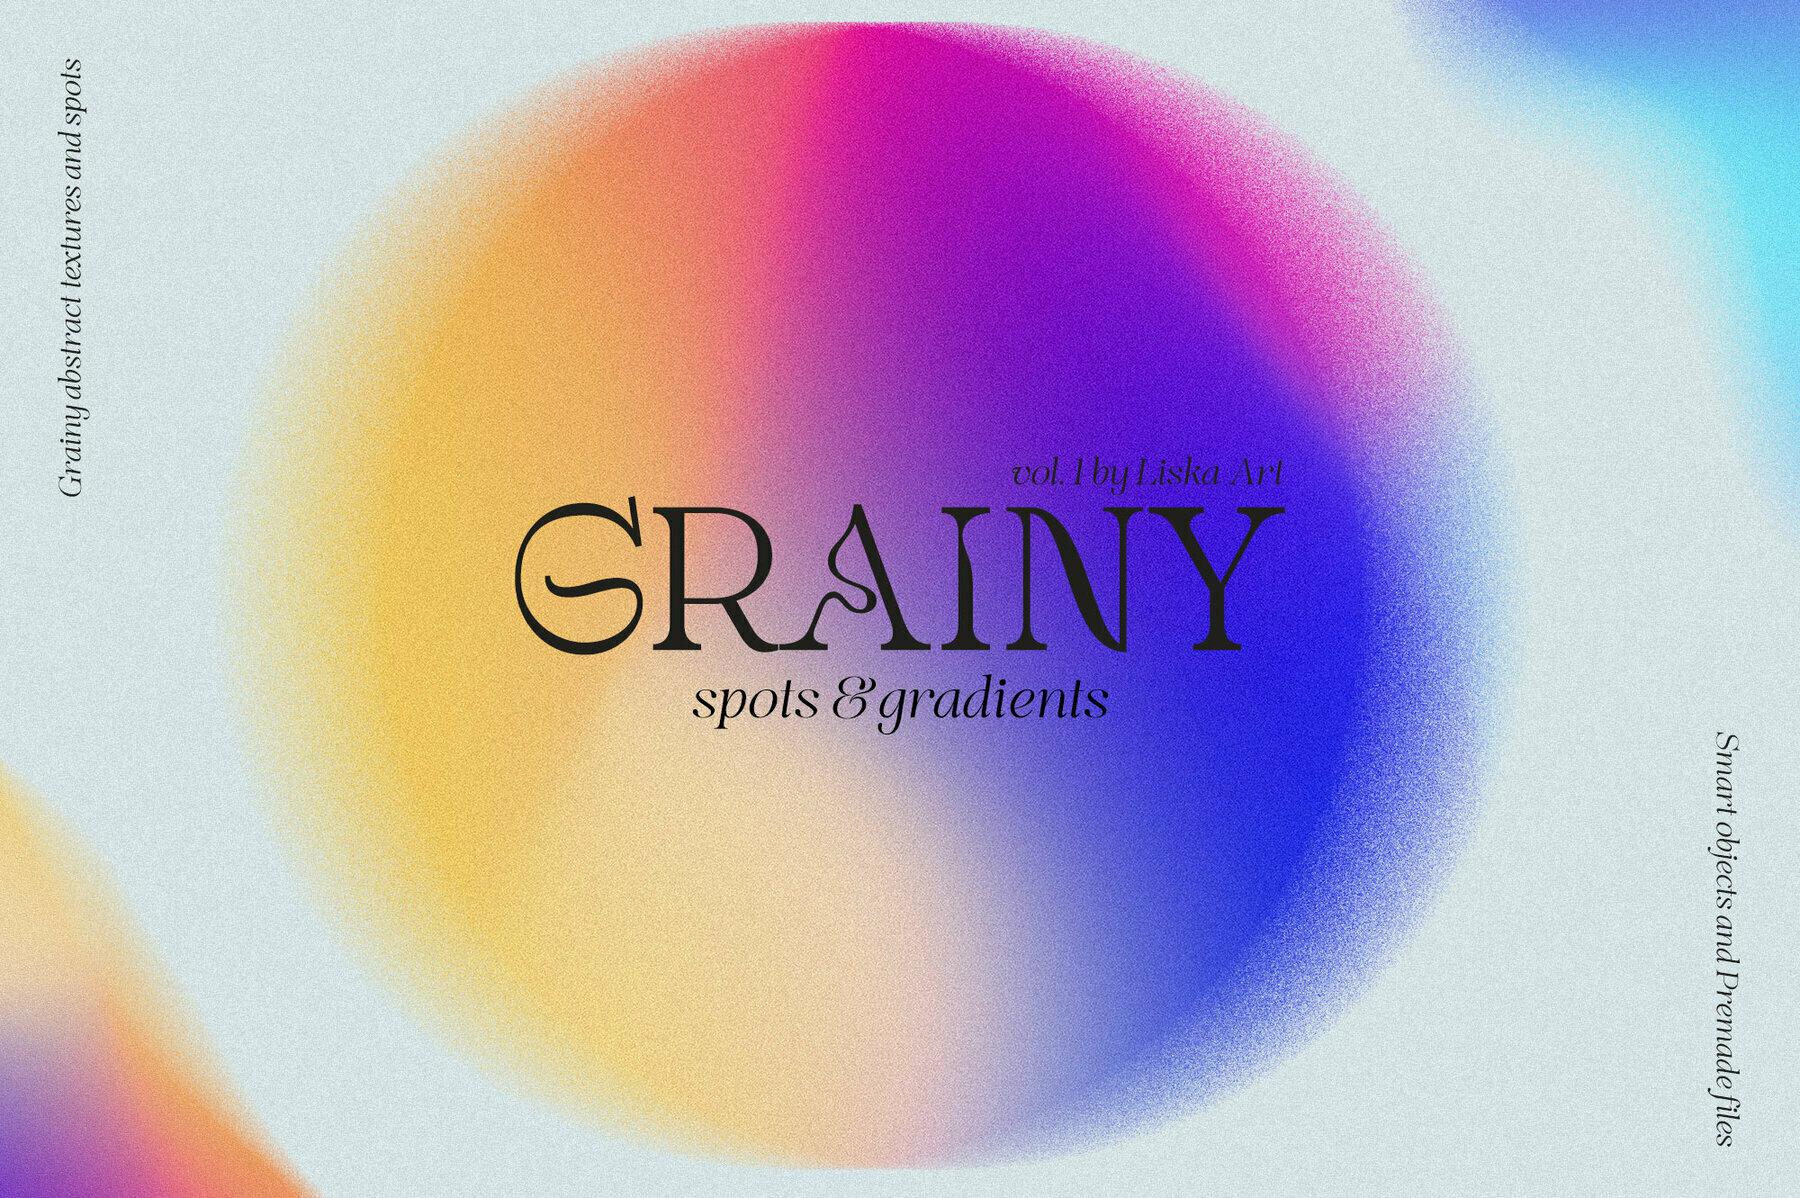 Grainy Spots   Gradients